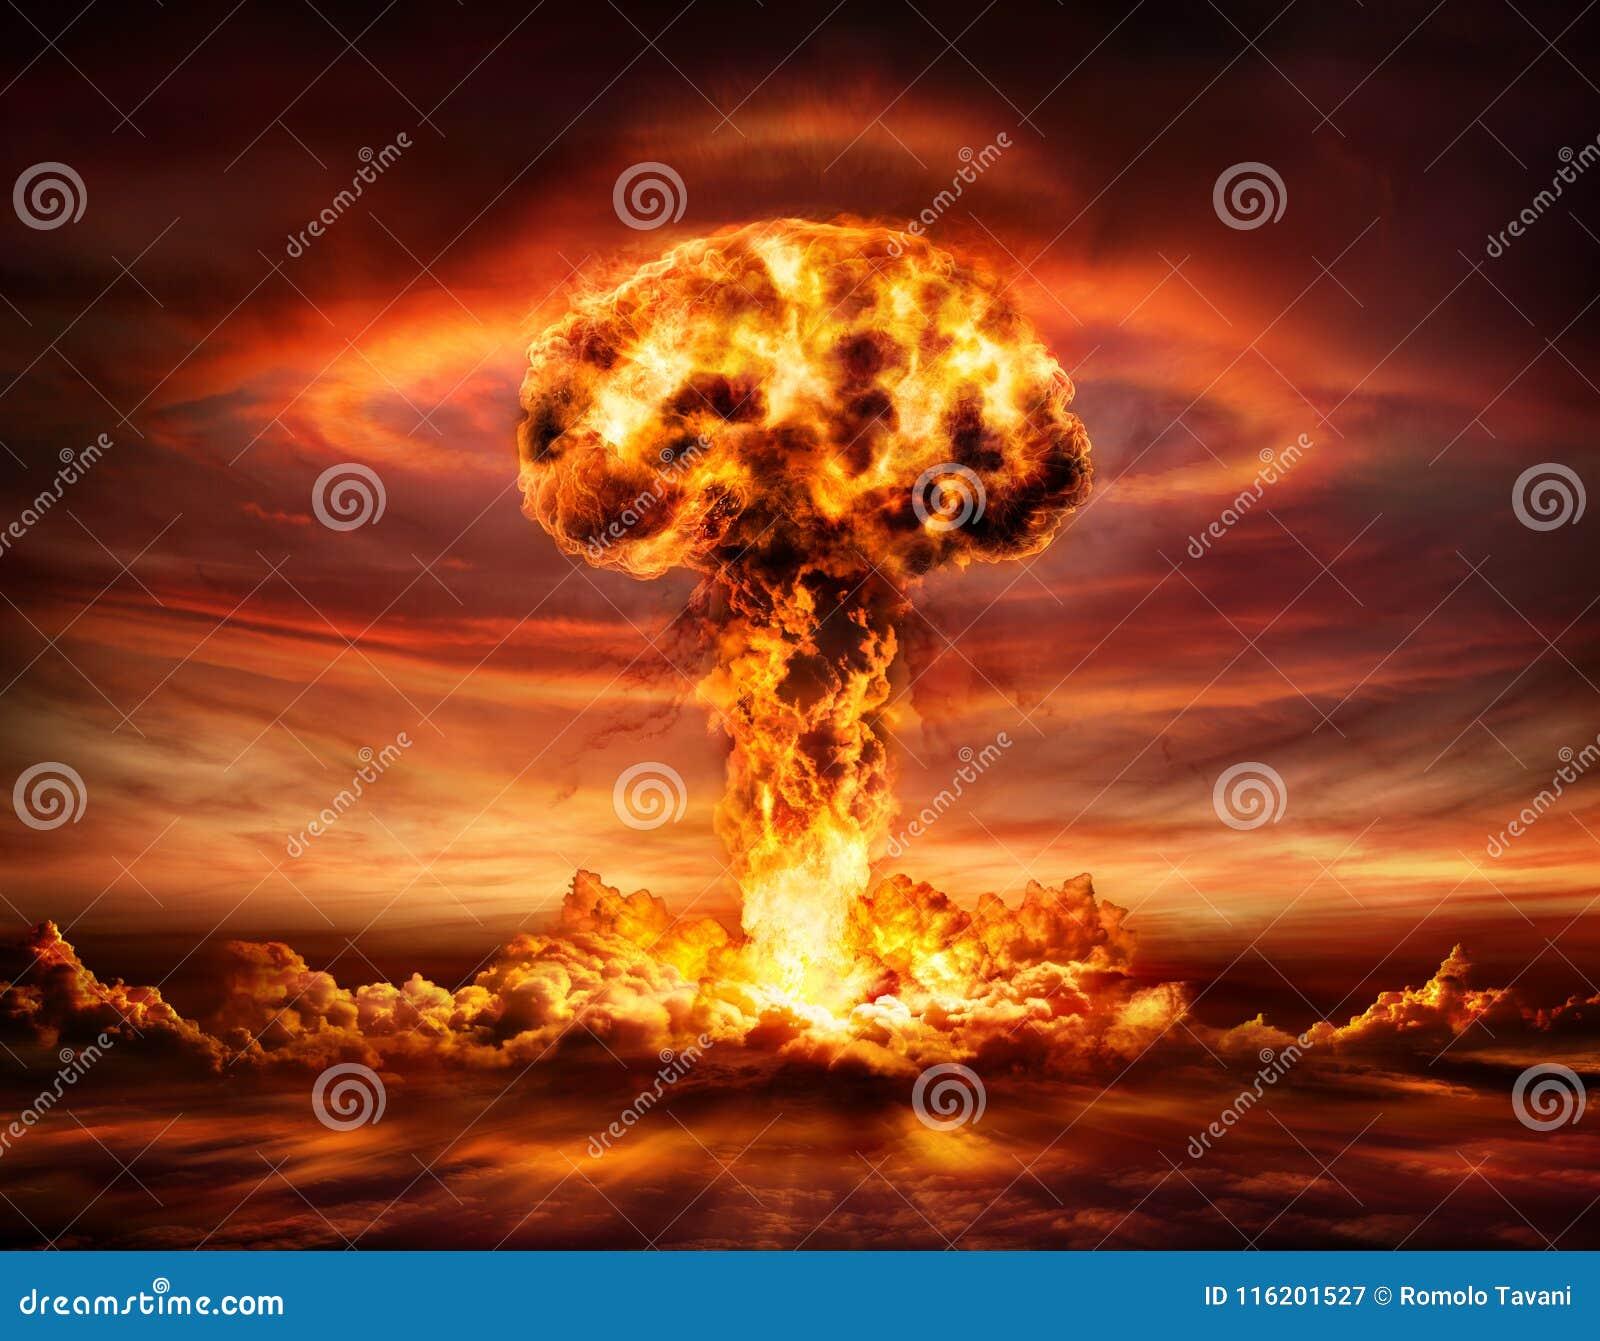 Download Nuclear Bomb Explosion - Mushroom Cloud Stock Image - Image of atom, mushroom: 116201527